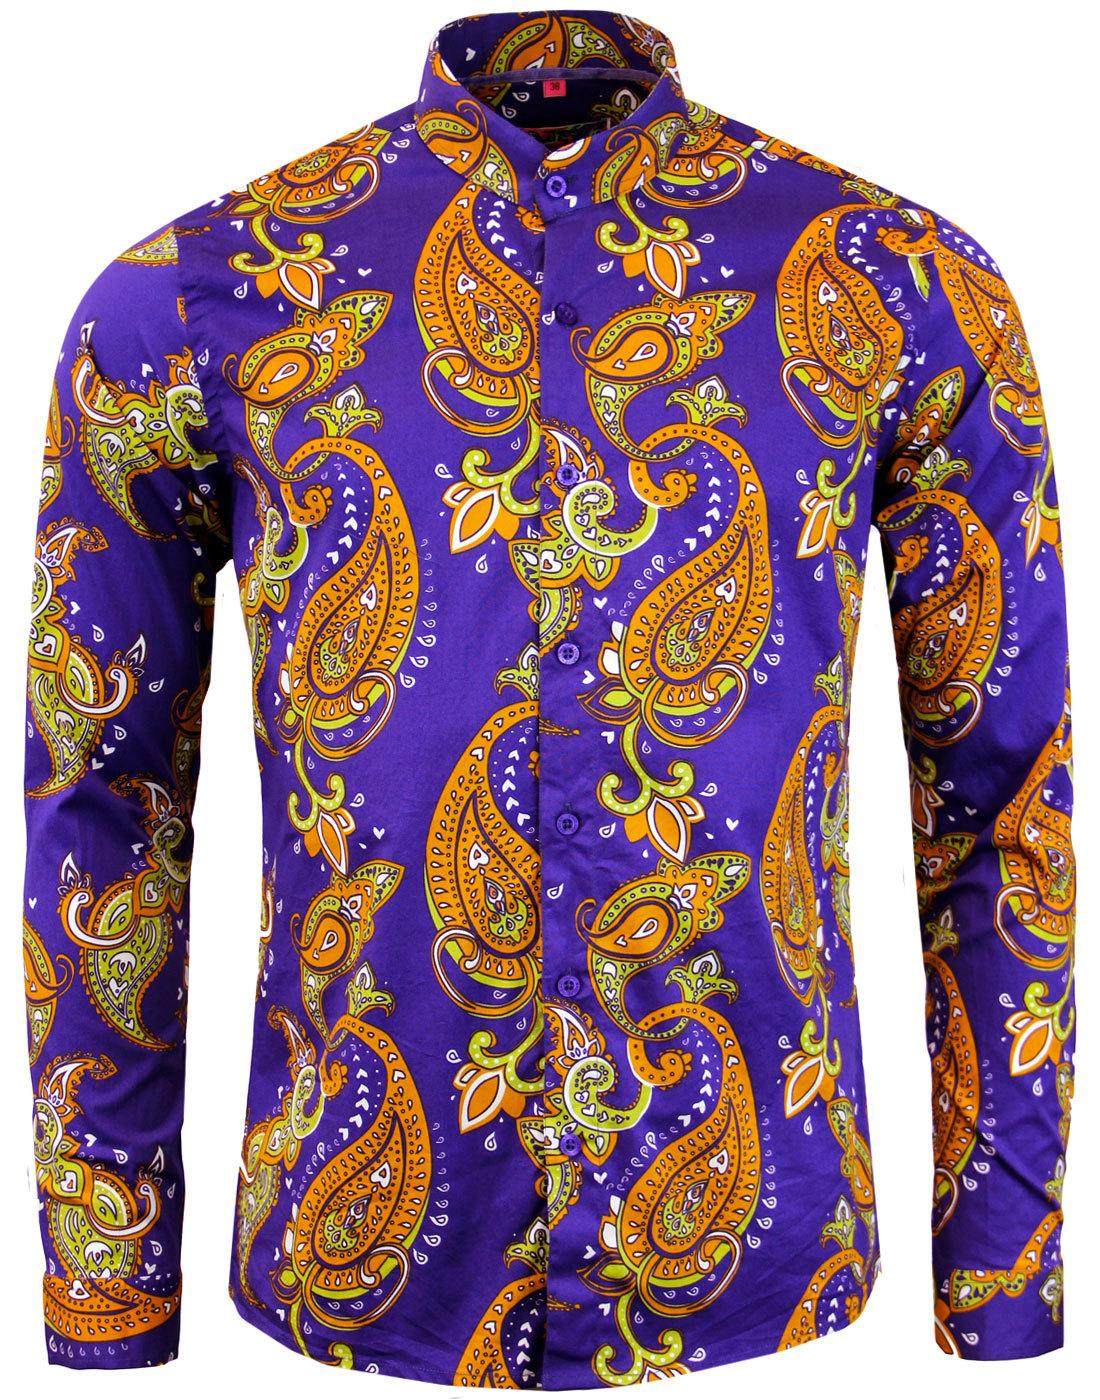 madcap england tanpura paisley mod grandad shirt